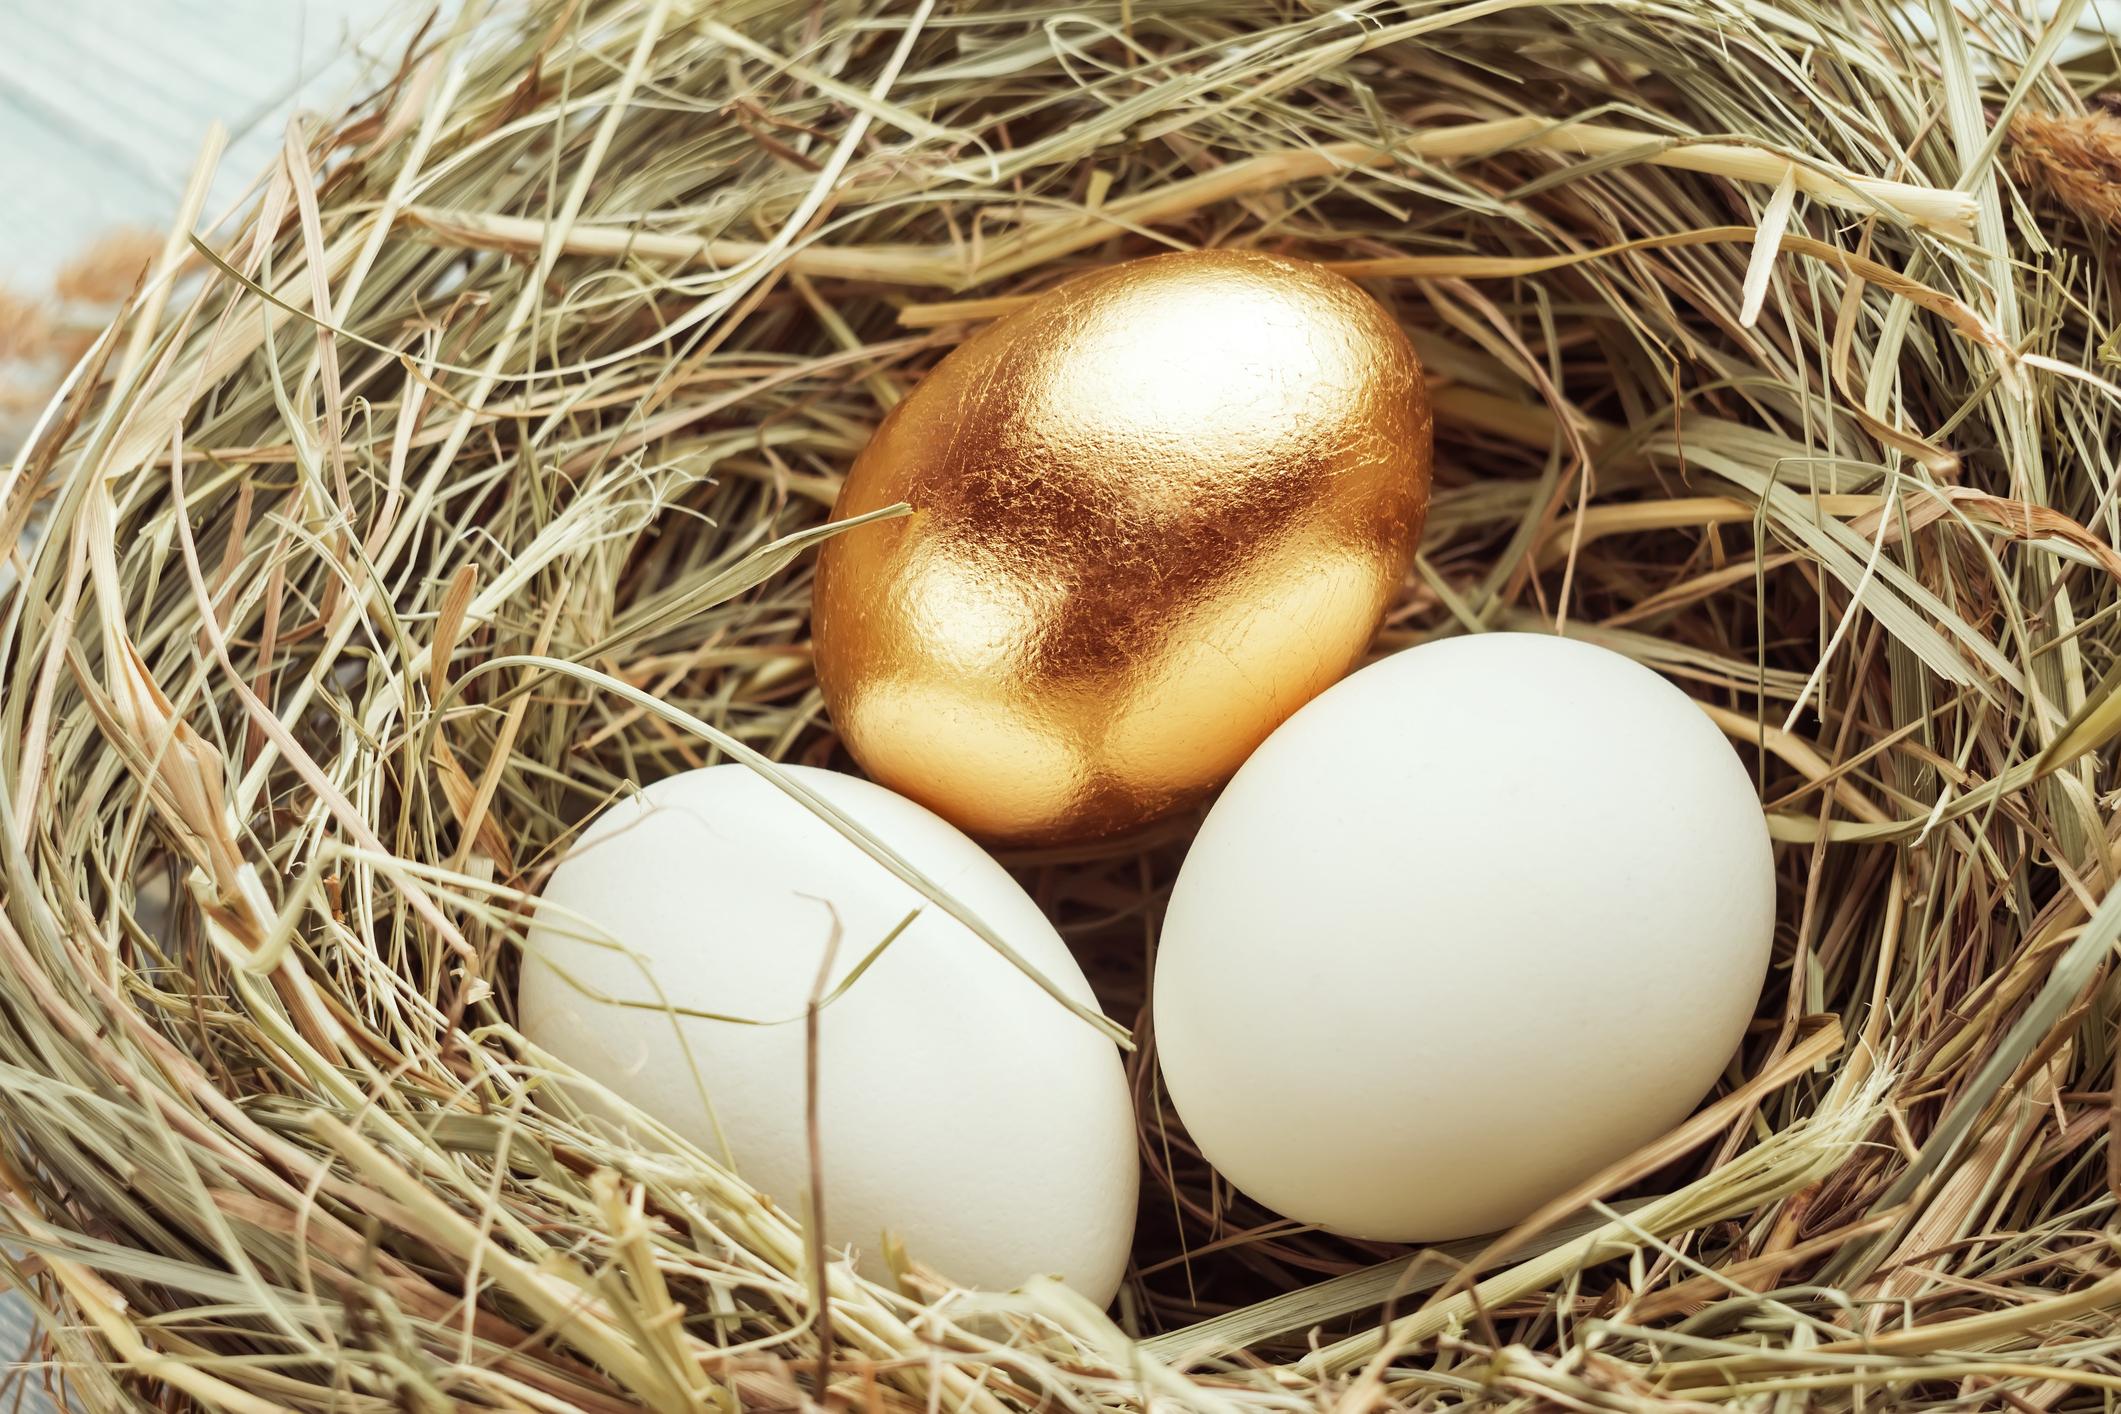 A golden egg among several within a birds nest.